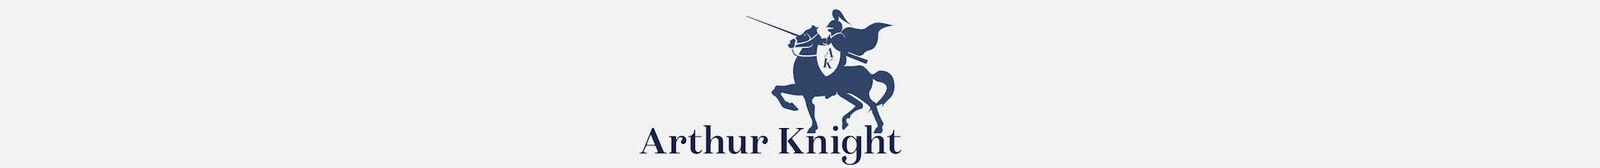 Acajou Marron Fermeture Éclair Bottes par Arthur Knight Knight Arthur Italie 79e51e